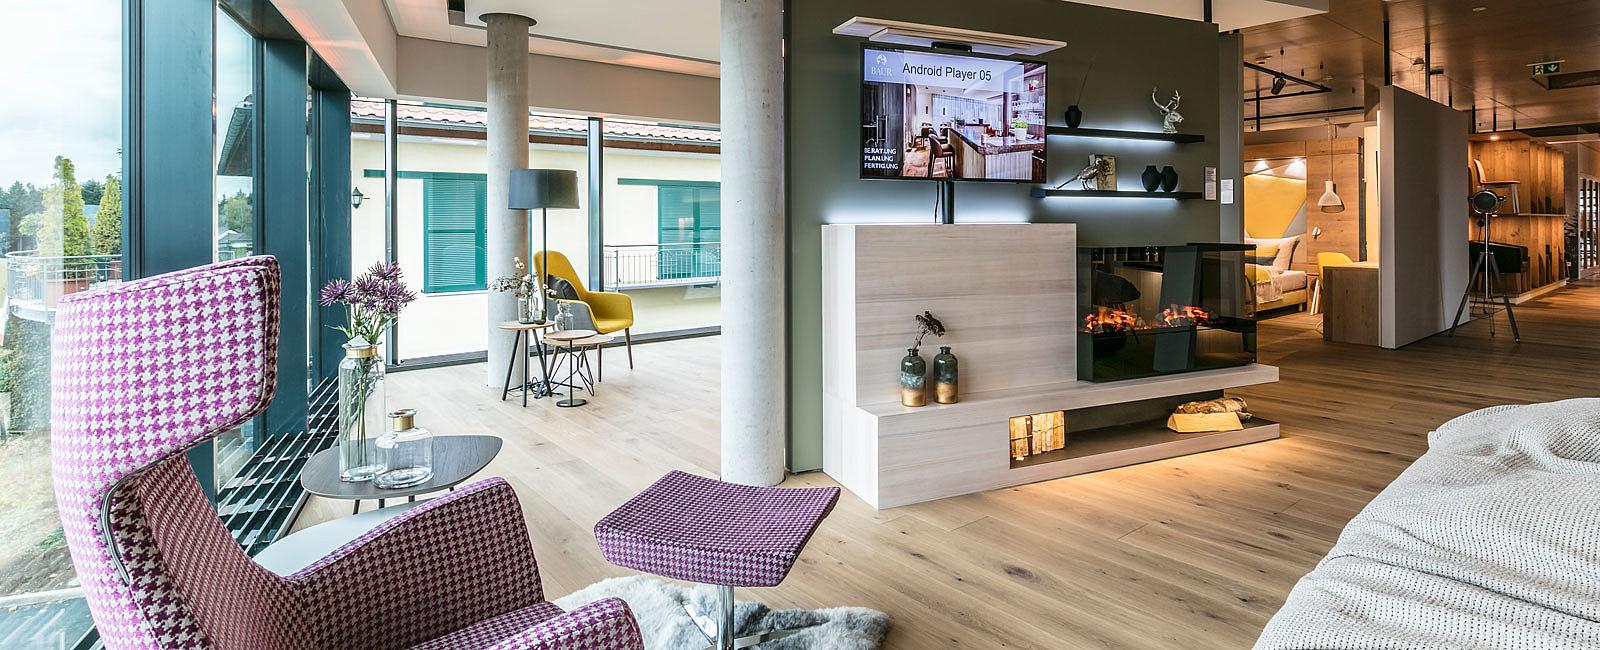 Super BAUR Wohnfaszination mit neuem Showroom - Connoisseur Circle News OG66